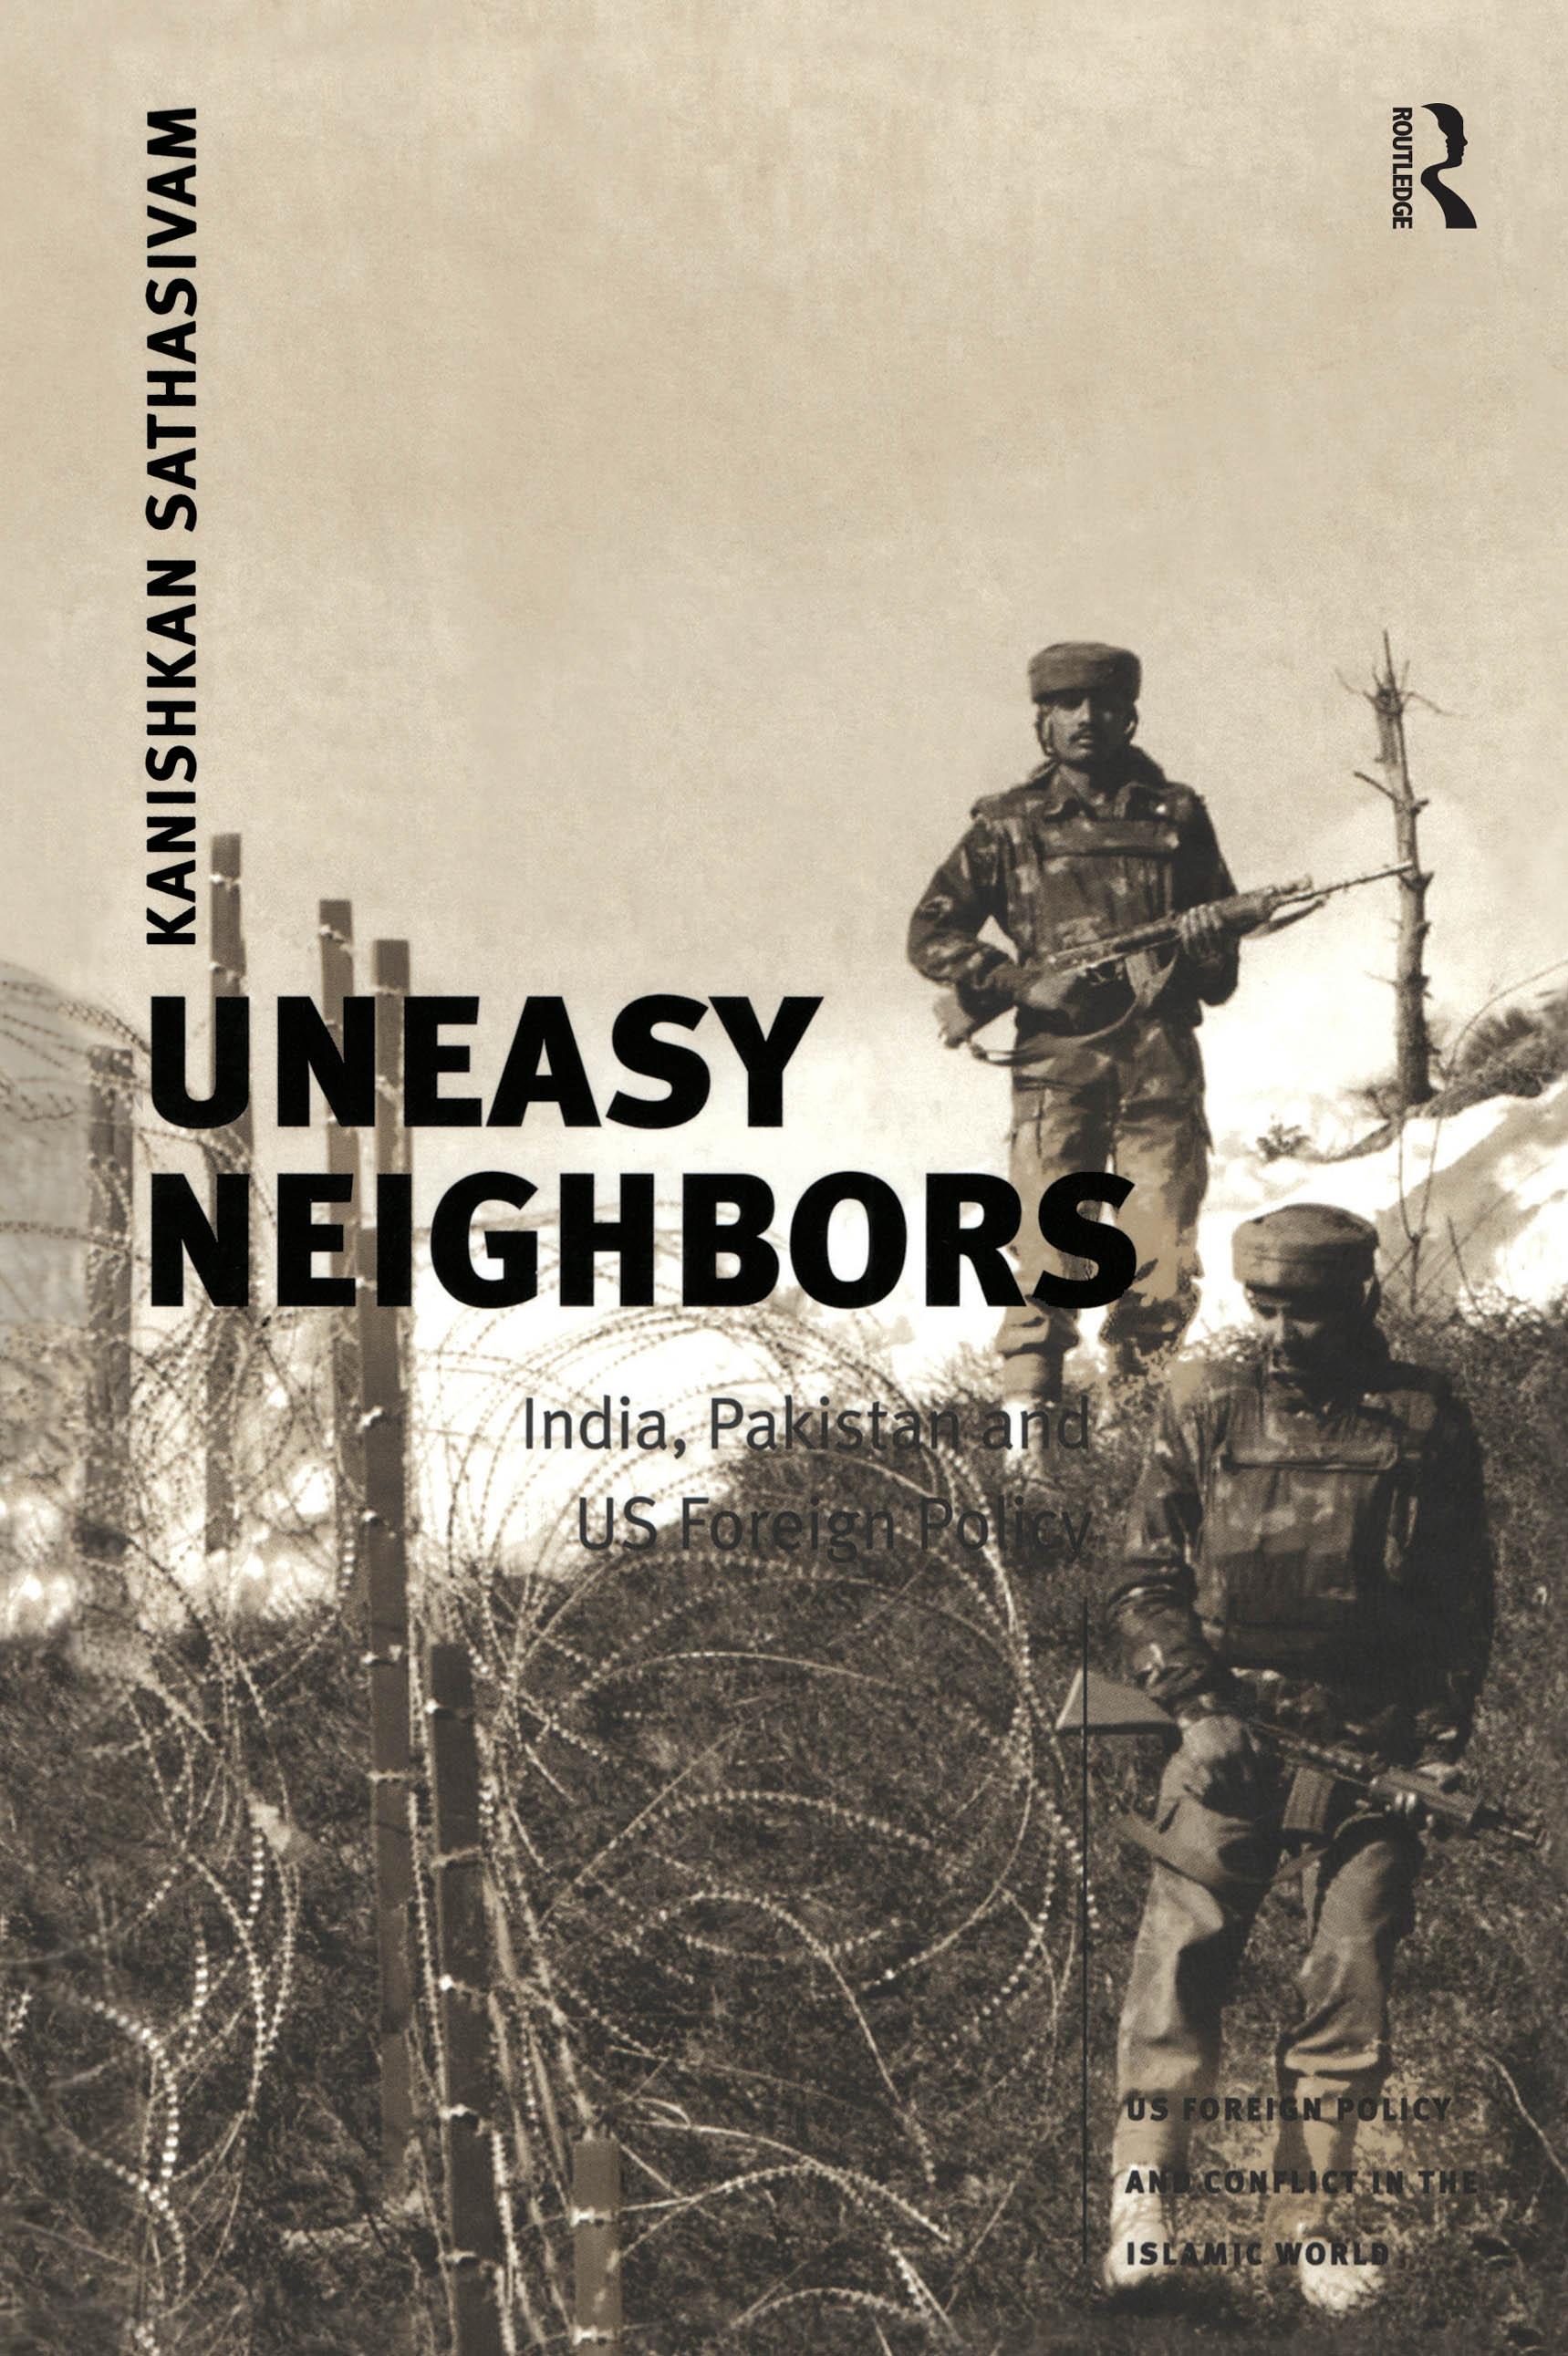 Uneasy Neighbors